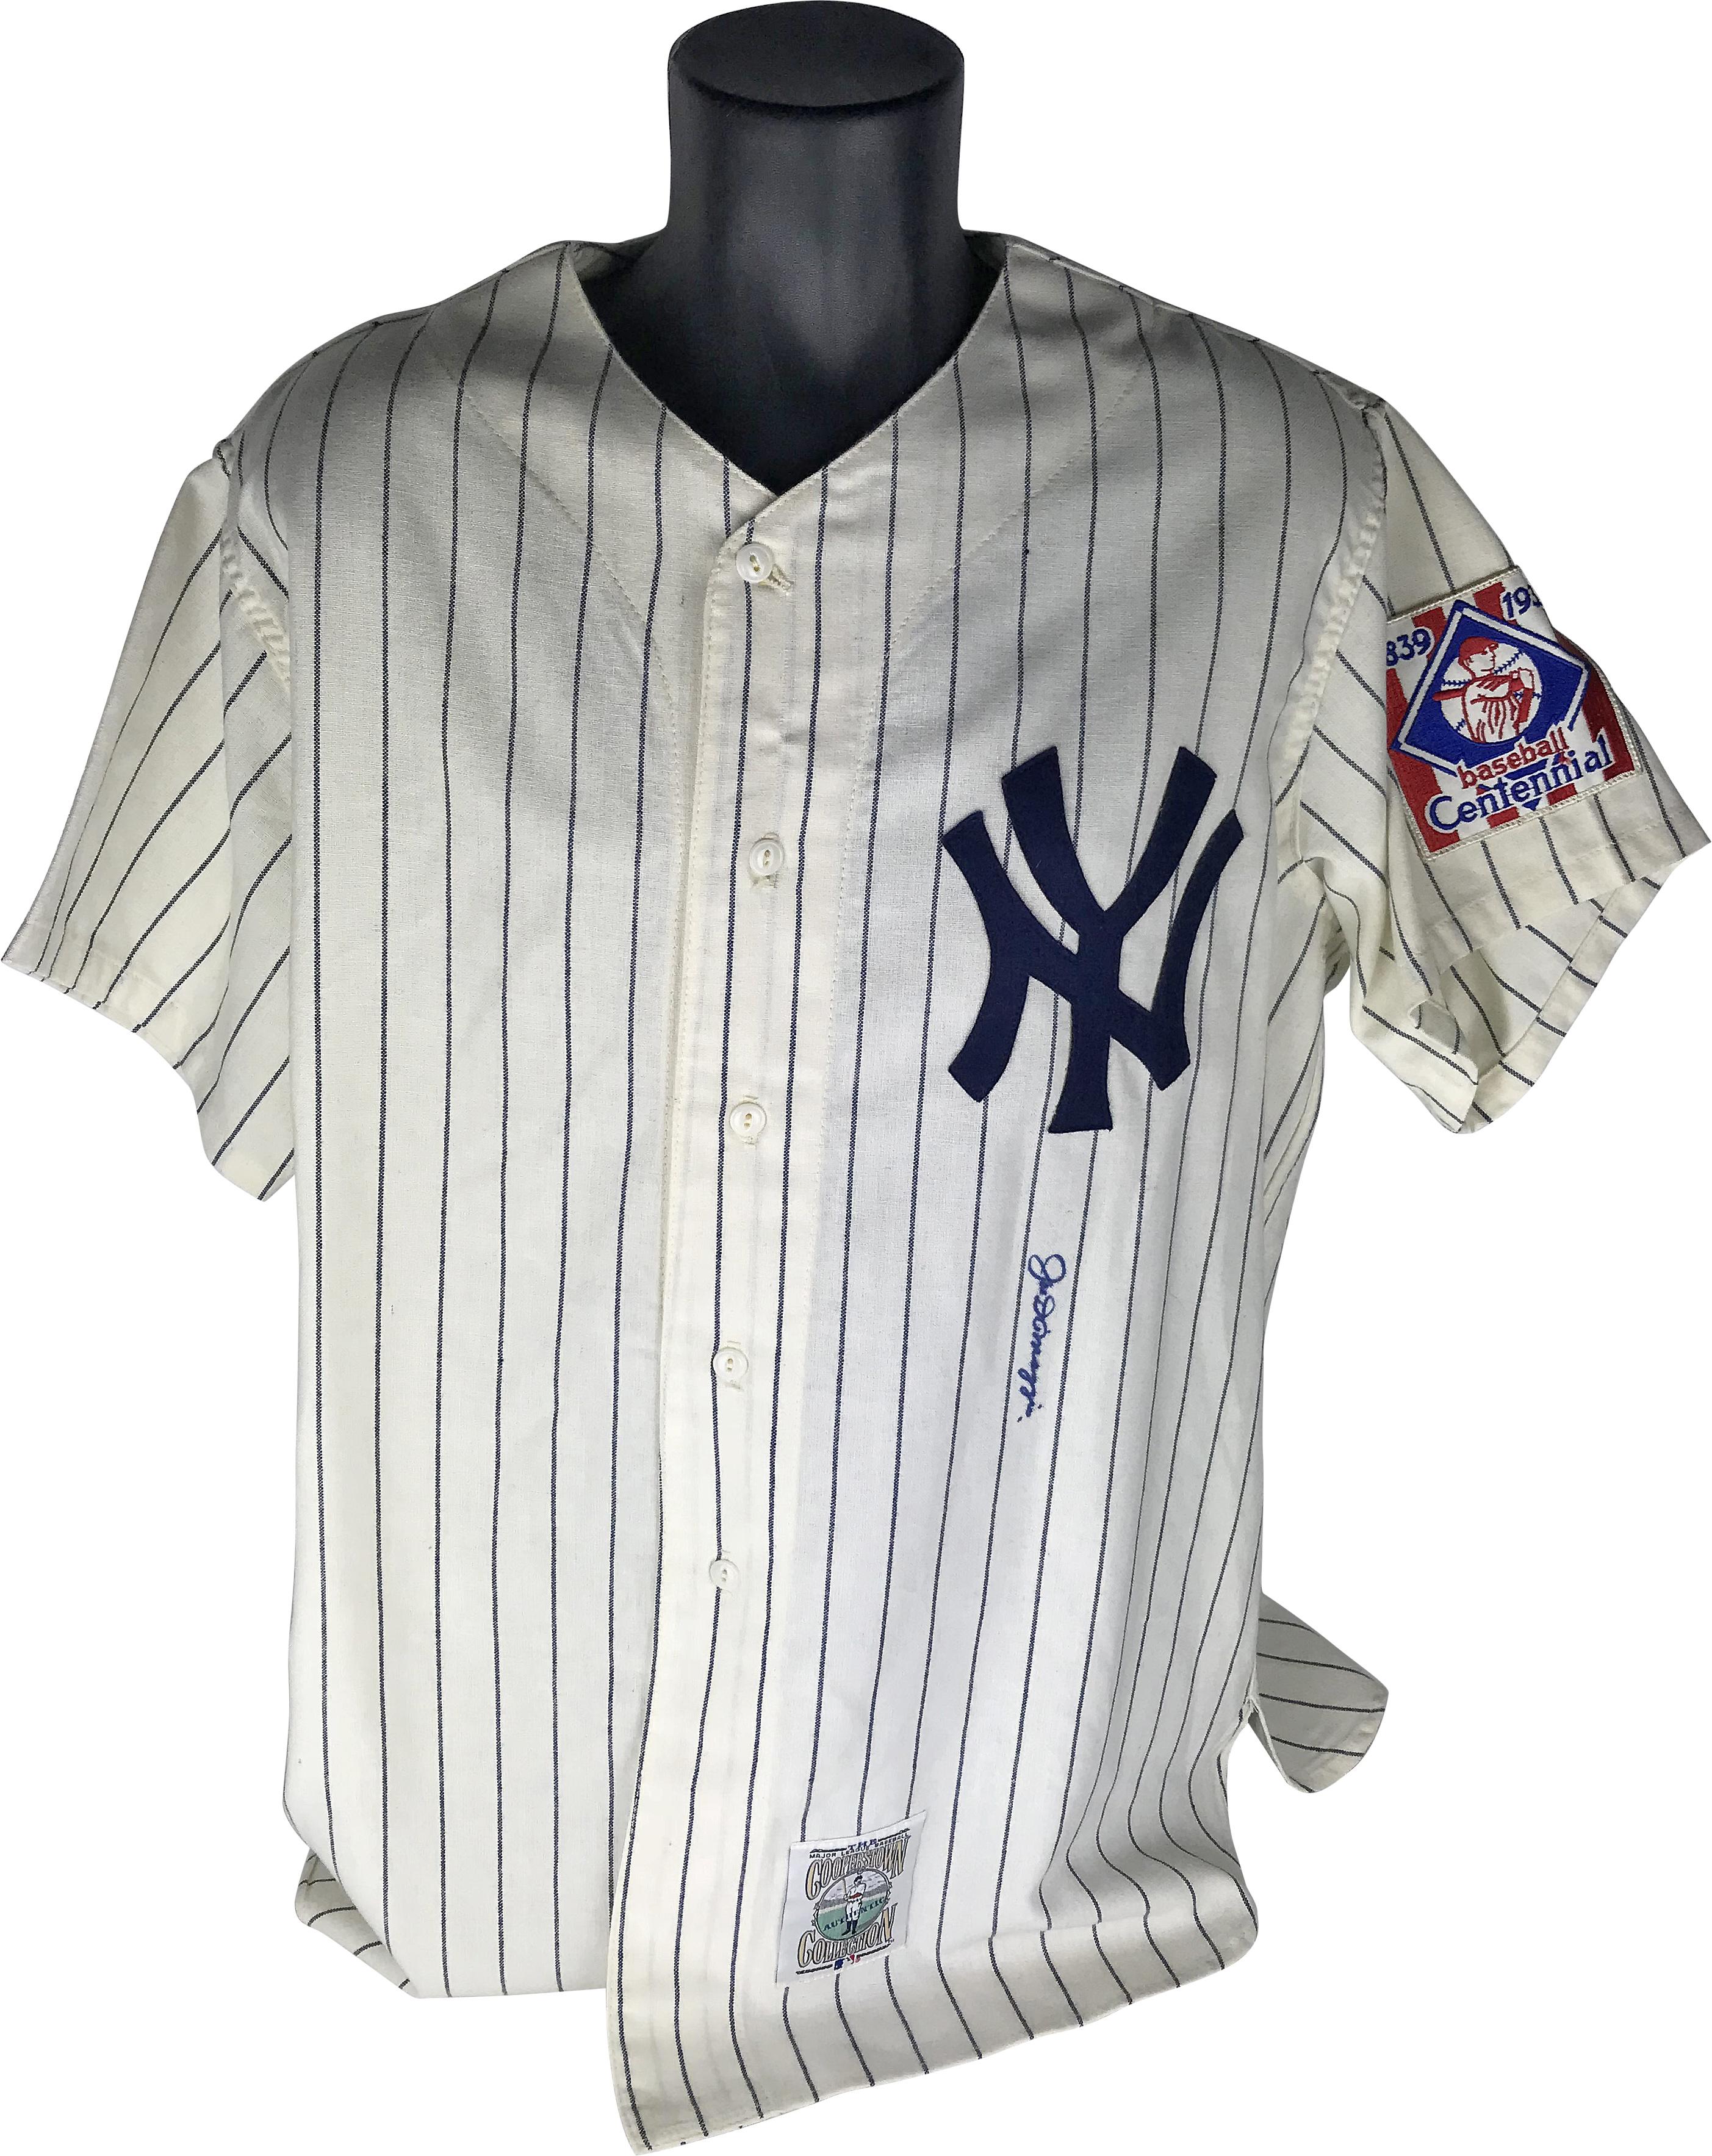 best service 0fc64 bd500 Lot Detail - Joe DiMaggio Signed 1939 Baseball Centennial NY ...